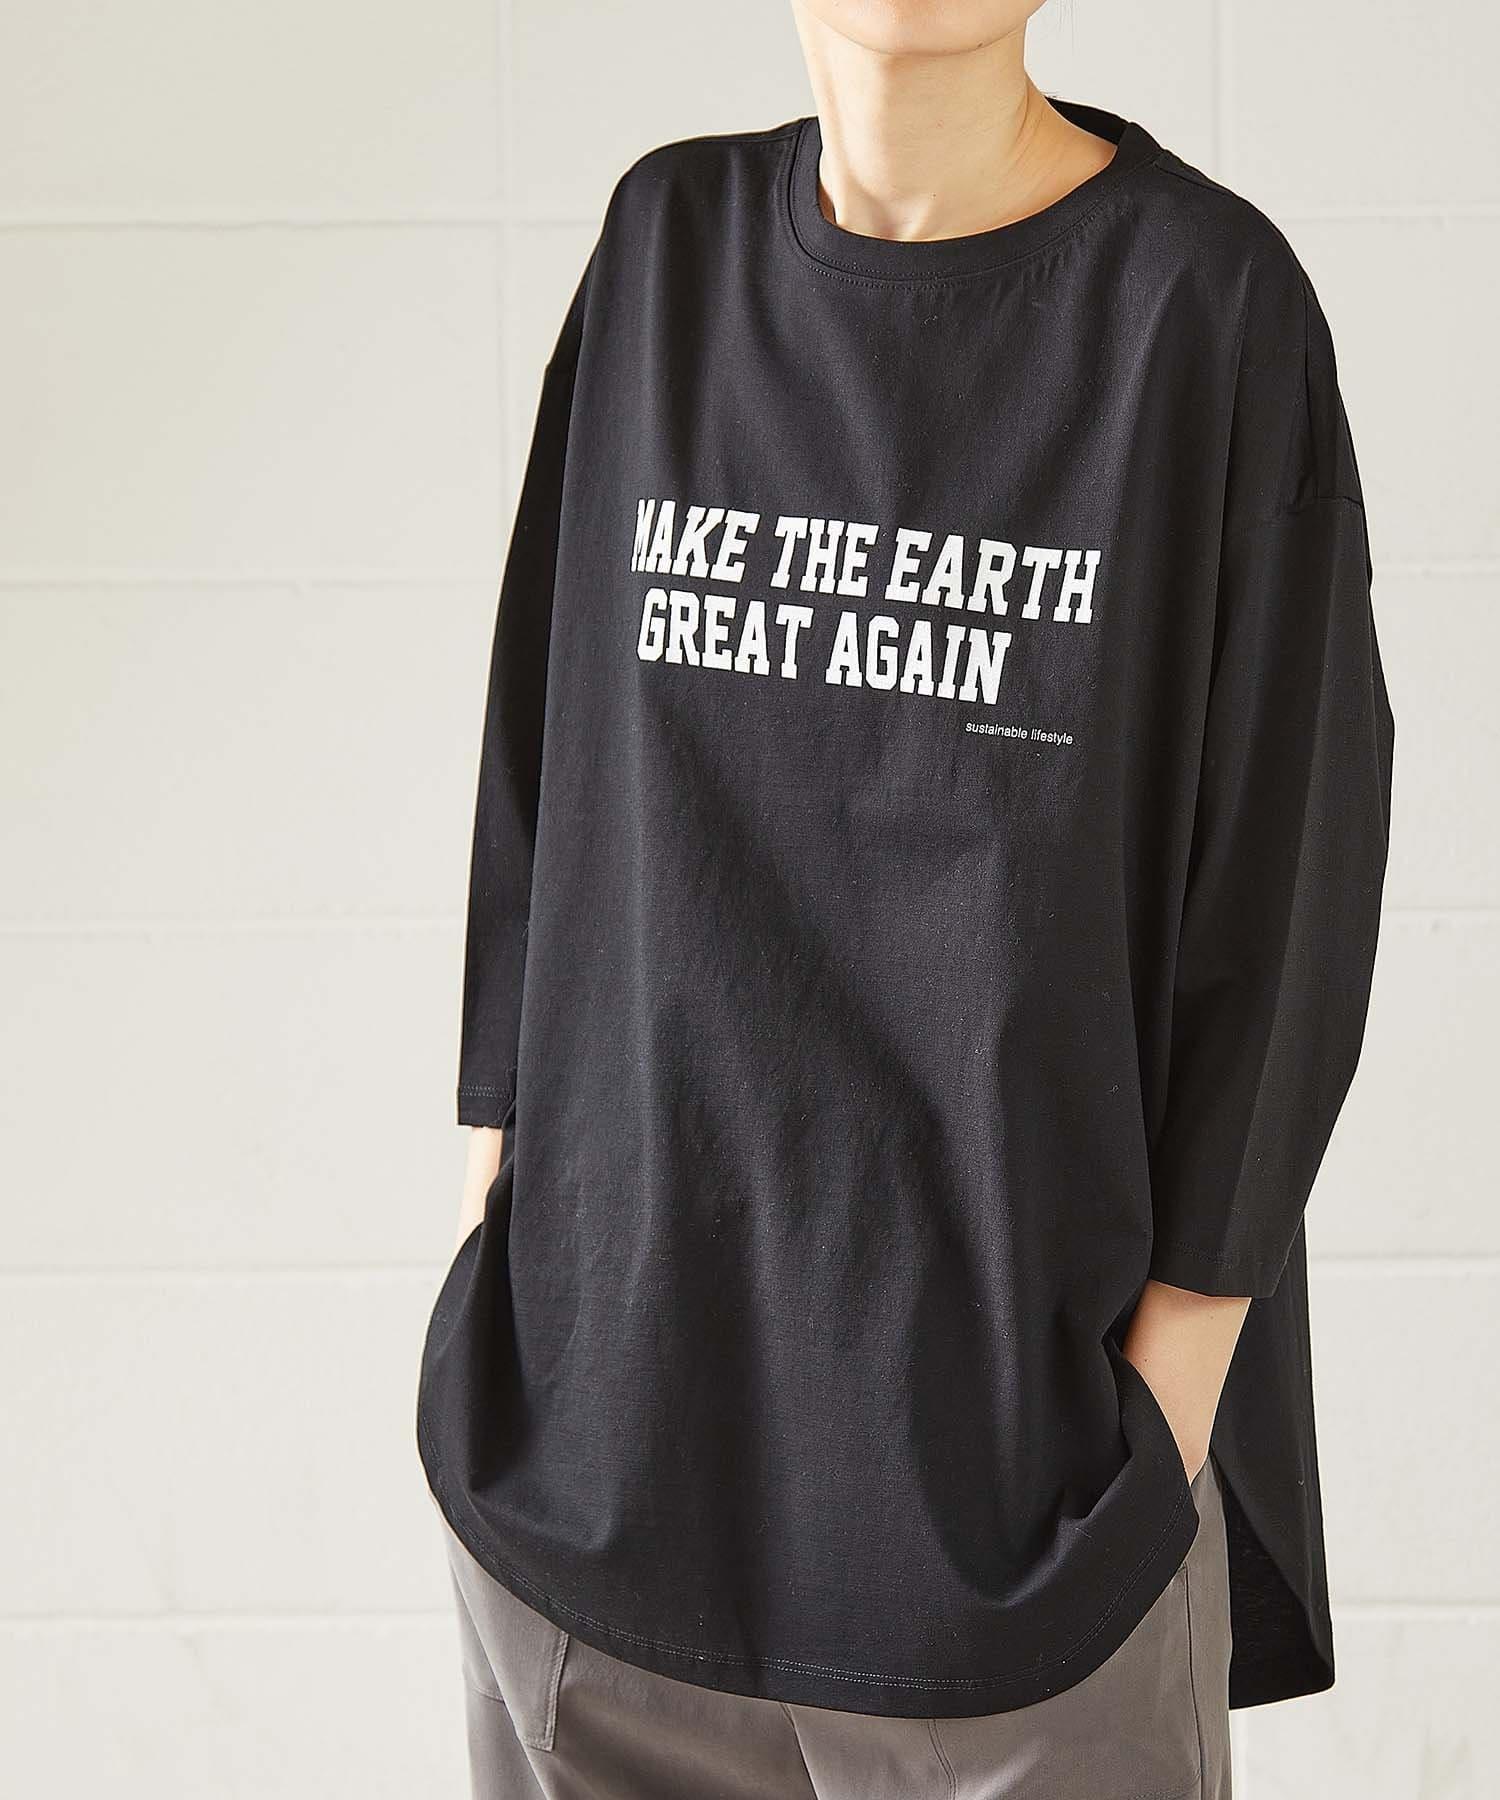 OUVRAGE CLASSE(ウヴラージュクラス) レディース 5分袖ロゴプリントオーバーTシャツ【MAKE THE EARTH】 ブラック